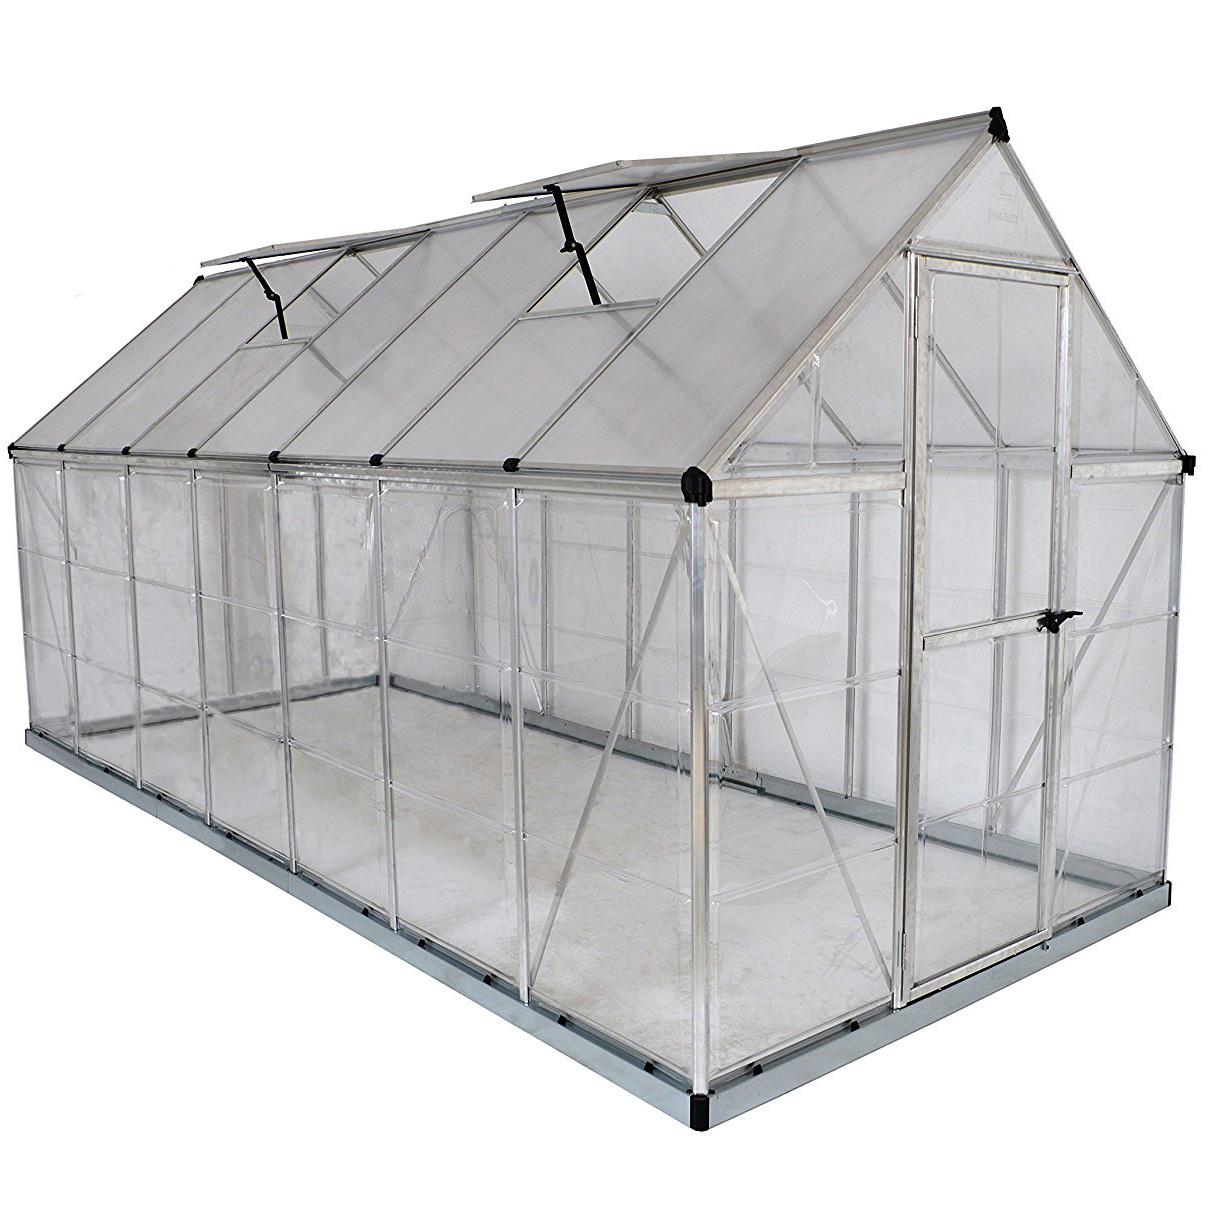 Palram - Canopia Hybrid 6' x 14' Greenhouse - Silver